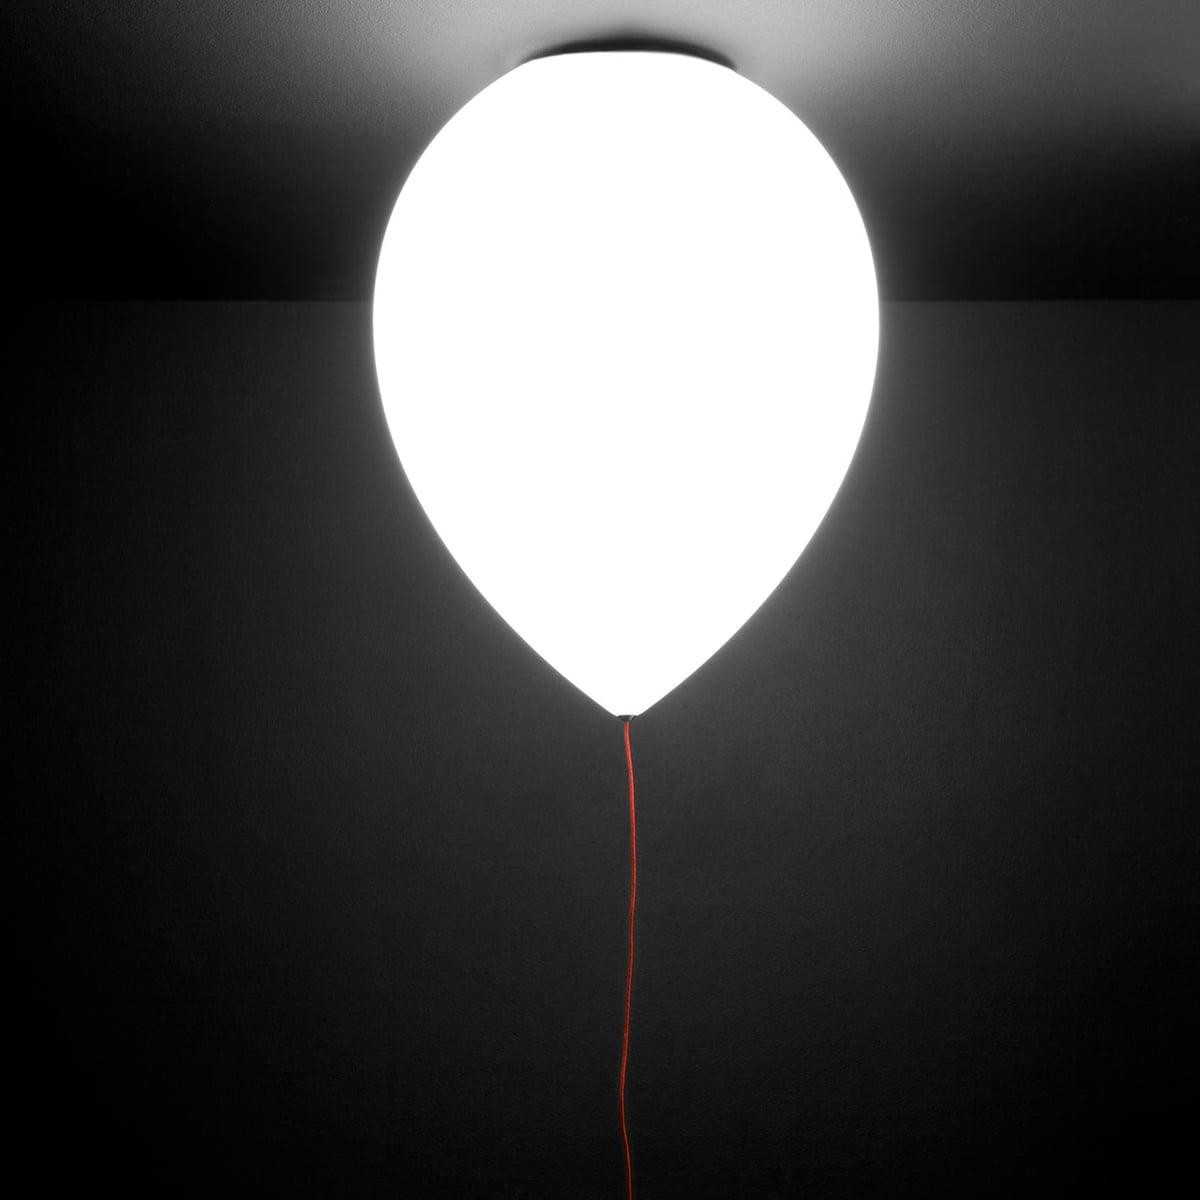 Balloon ceiling lamp by Estiluz in our shop